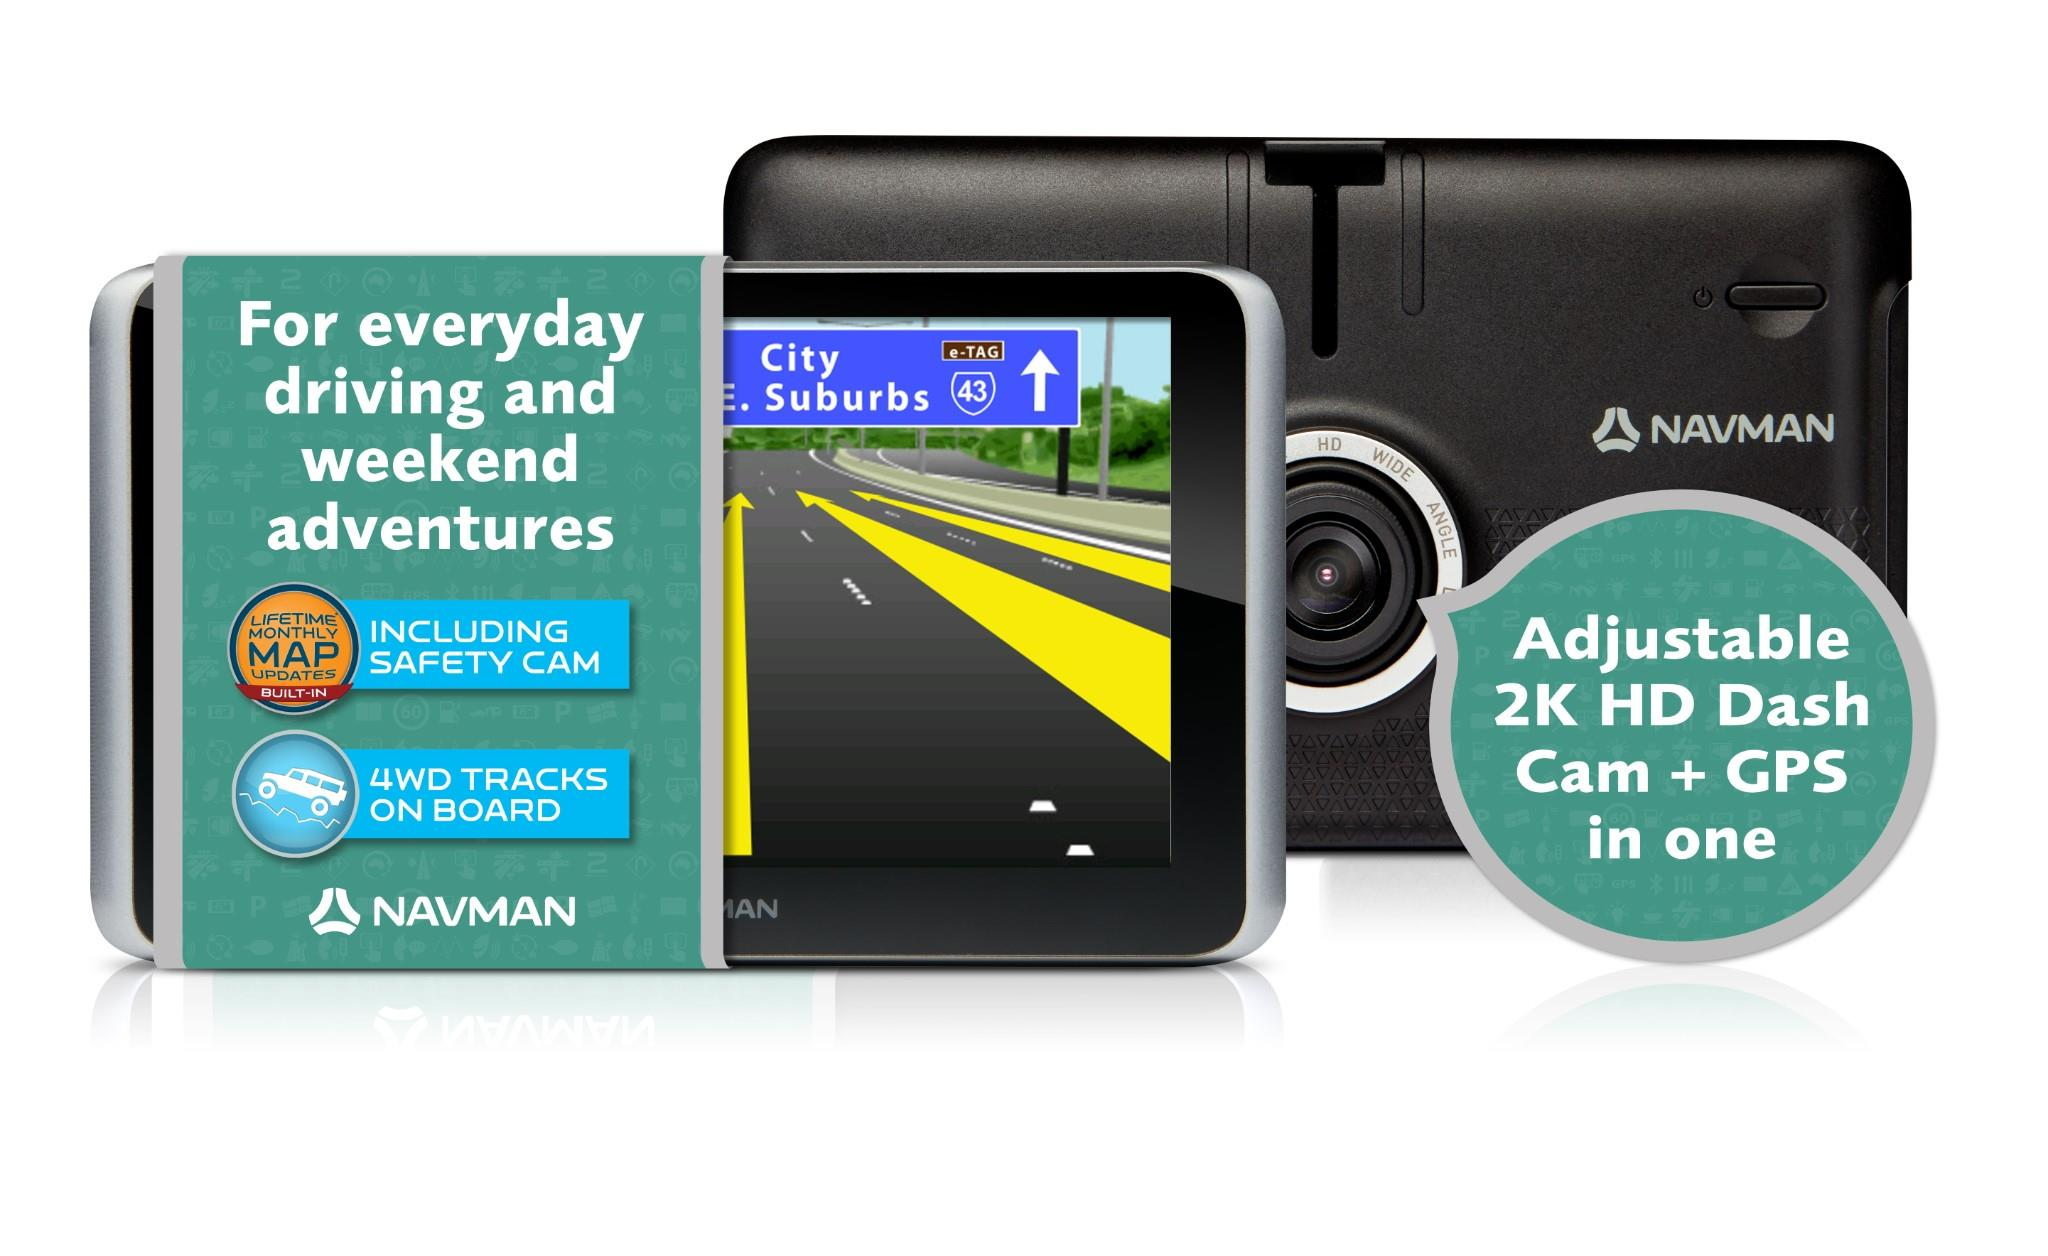 navman safety camera product key